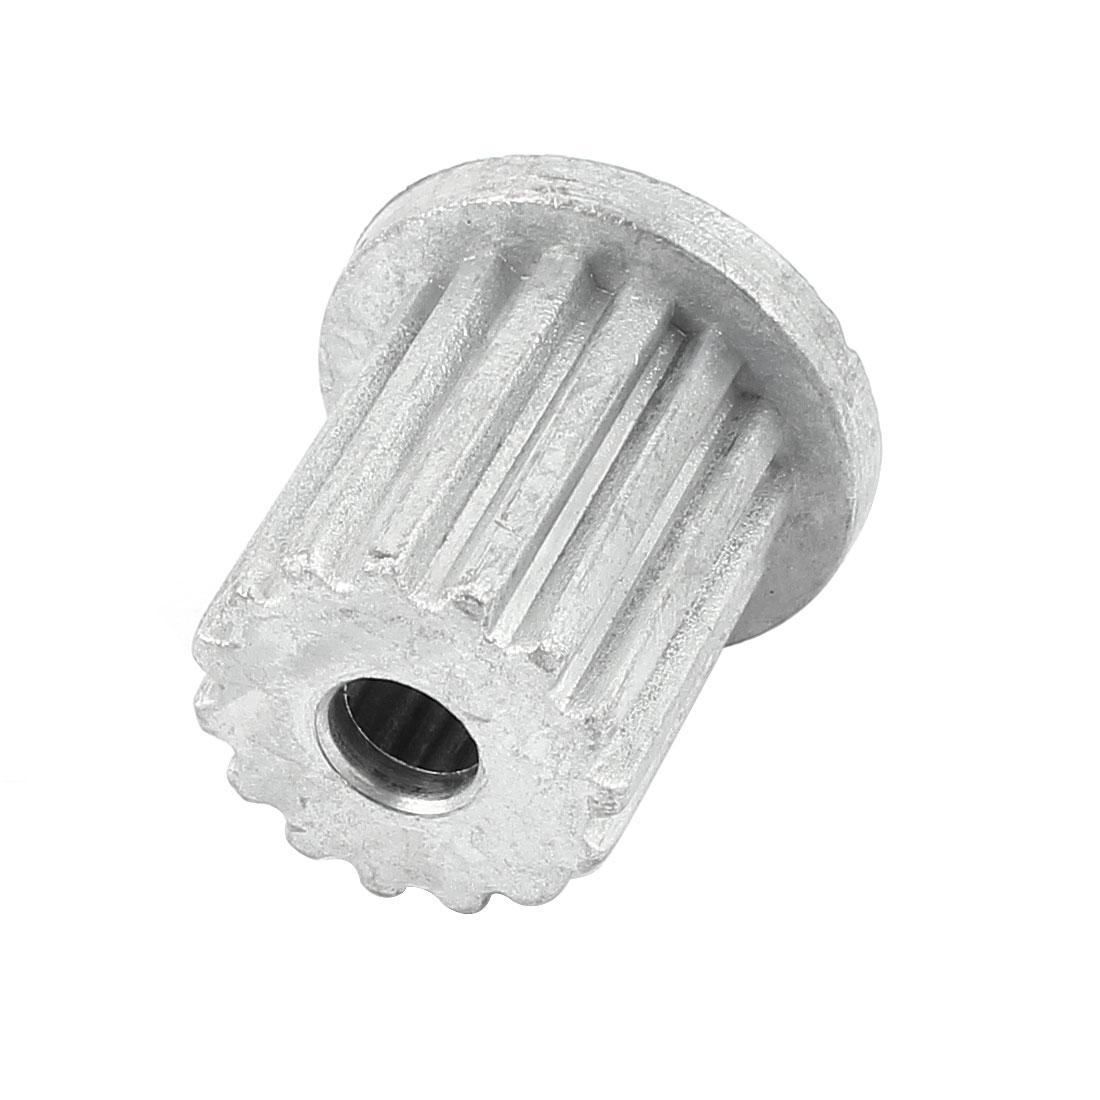 11mm Knurled Hole 15 Teeth 15T Pulsator Core for LG Washing Machine - image 1 of 1